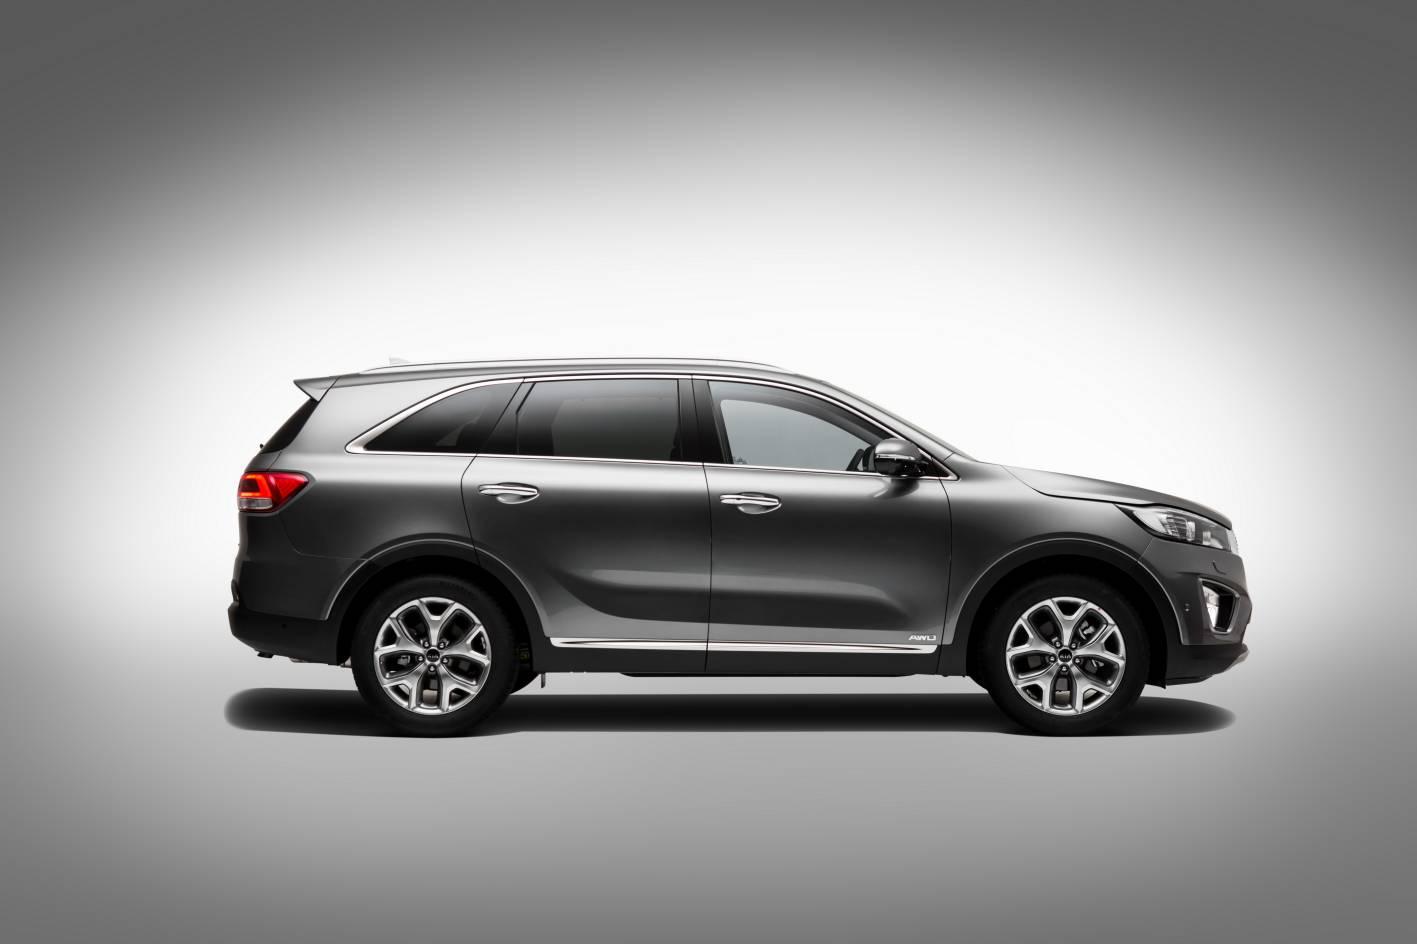 kia cars news all new 2015 kia sorento unveiled. Black Bedroom Furniture Sets. Home Design Ideas